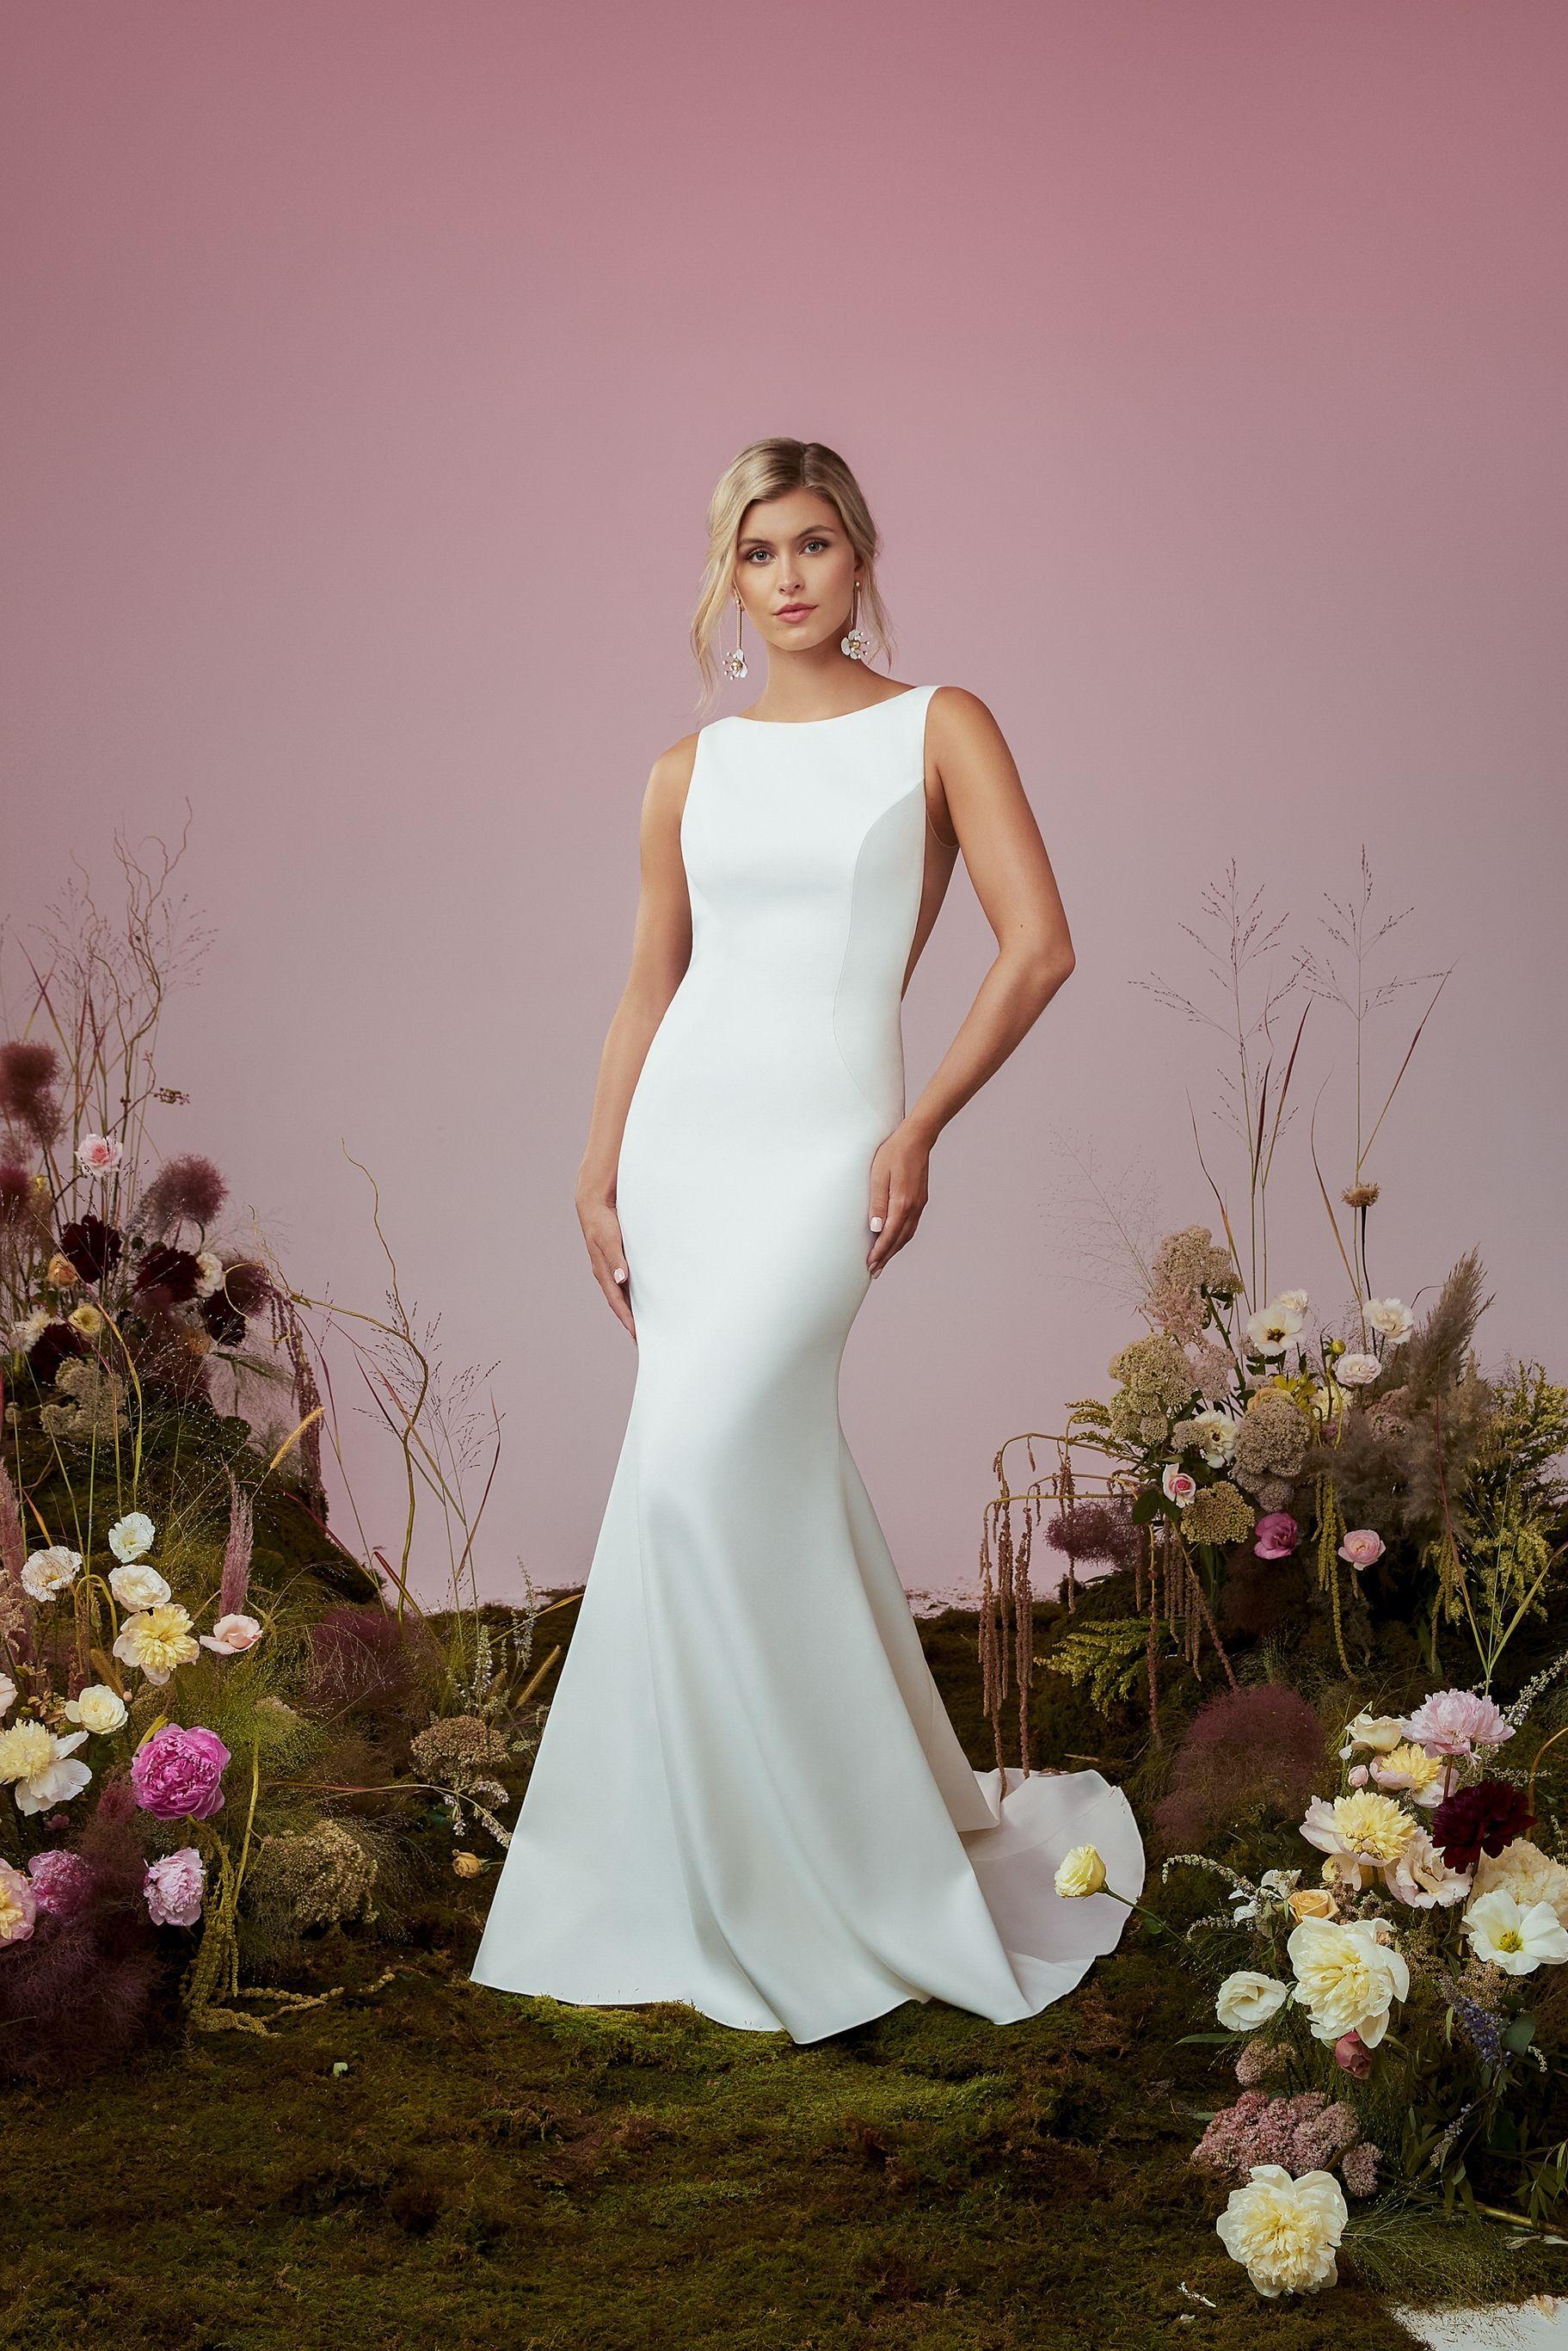 Simple Crepe Bateau Wedding Dress By Blue Willow Bride Wedding Dress Necklines Simple Wedding Gowns Wedding Dresses [ 2733 x 1823 Pixel ]